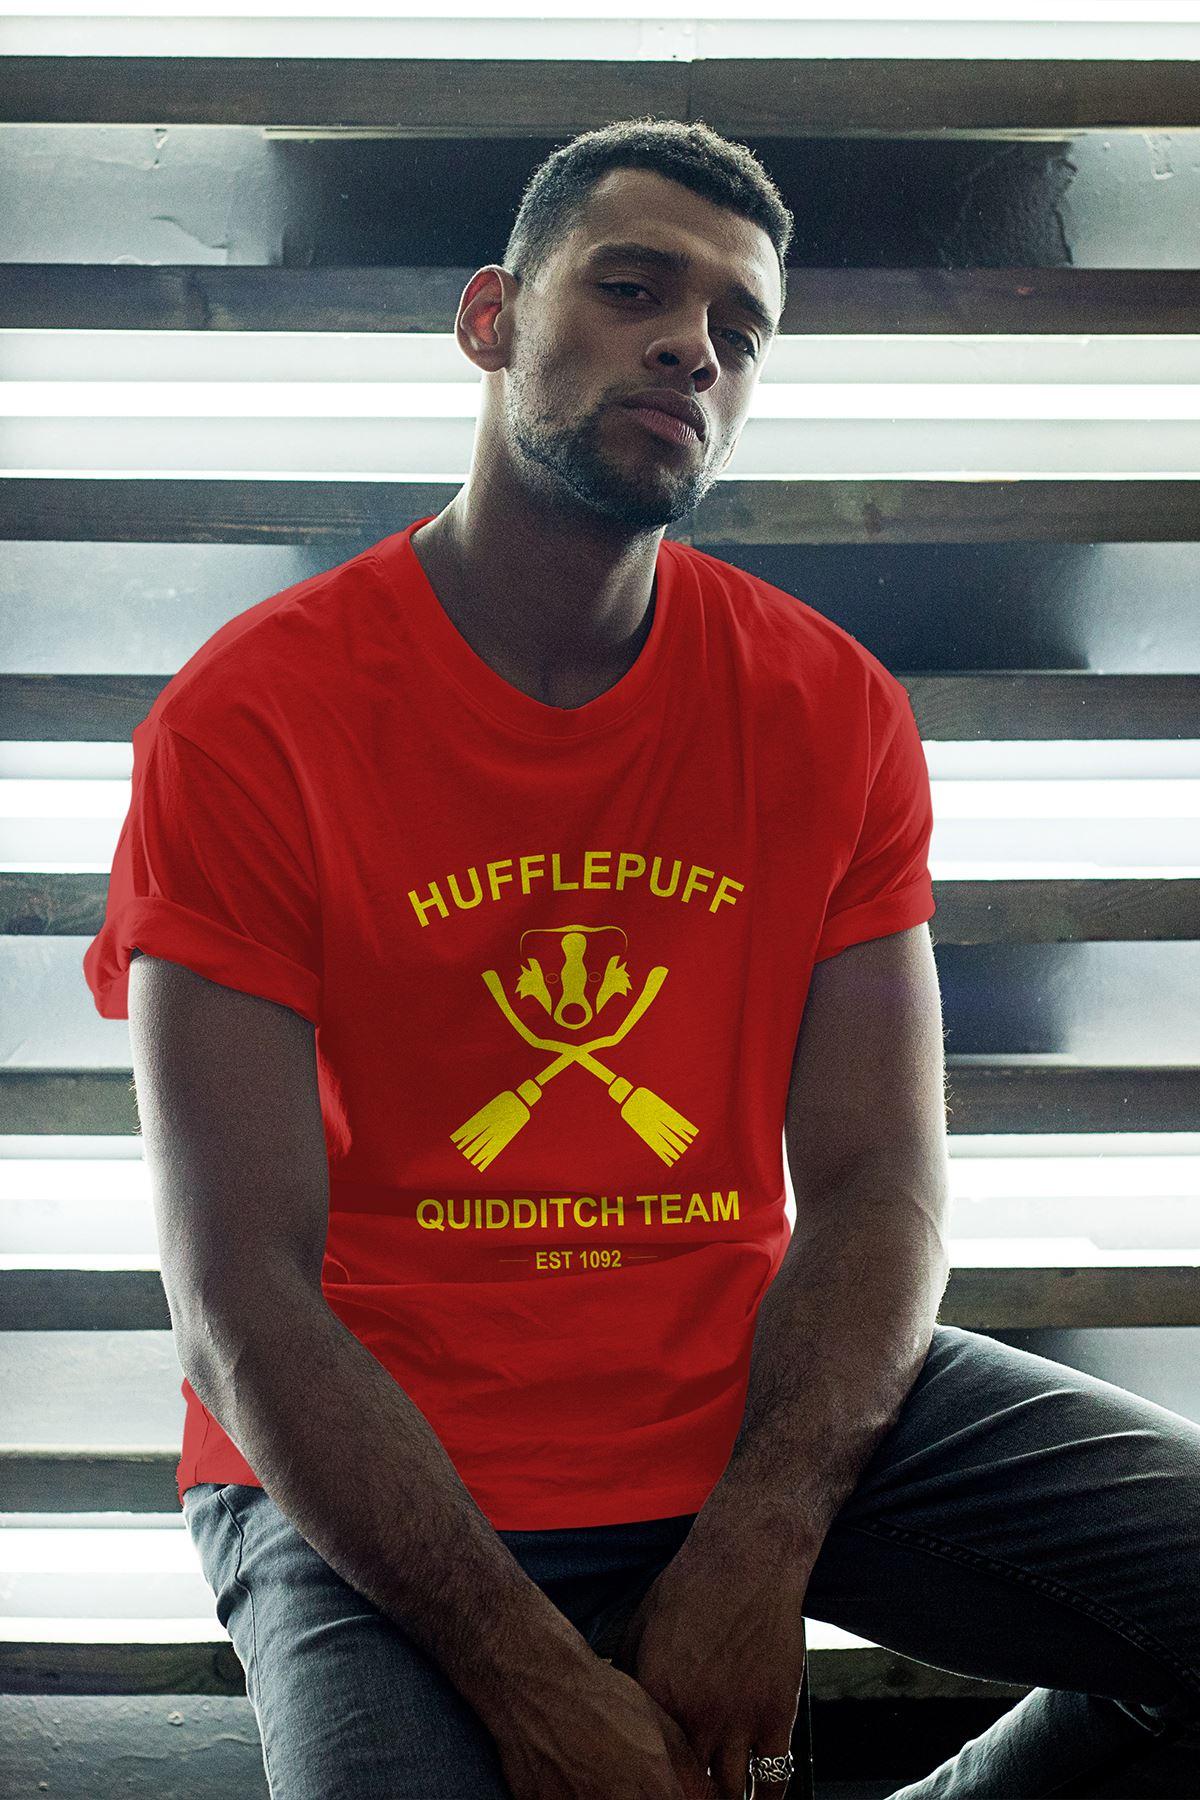 Hufflepuff Kırmızı Erkek Oversize Tshirt - Tişört